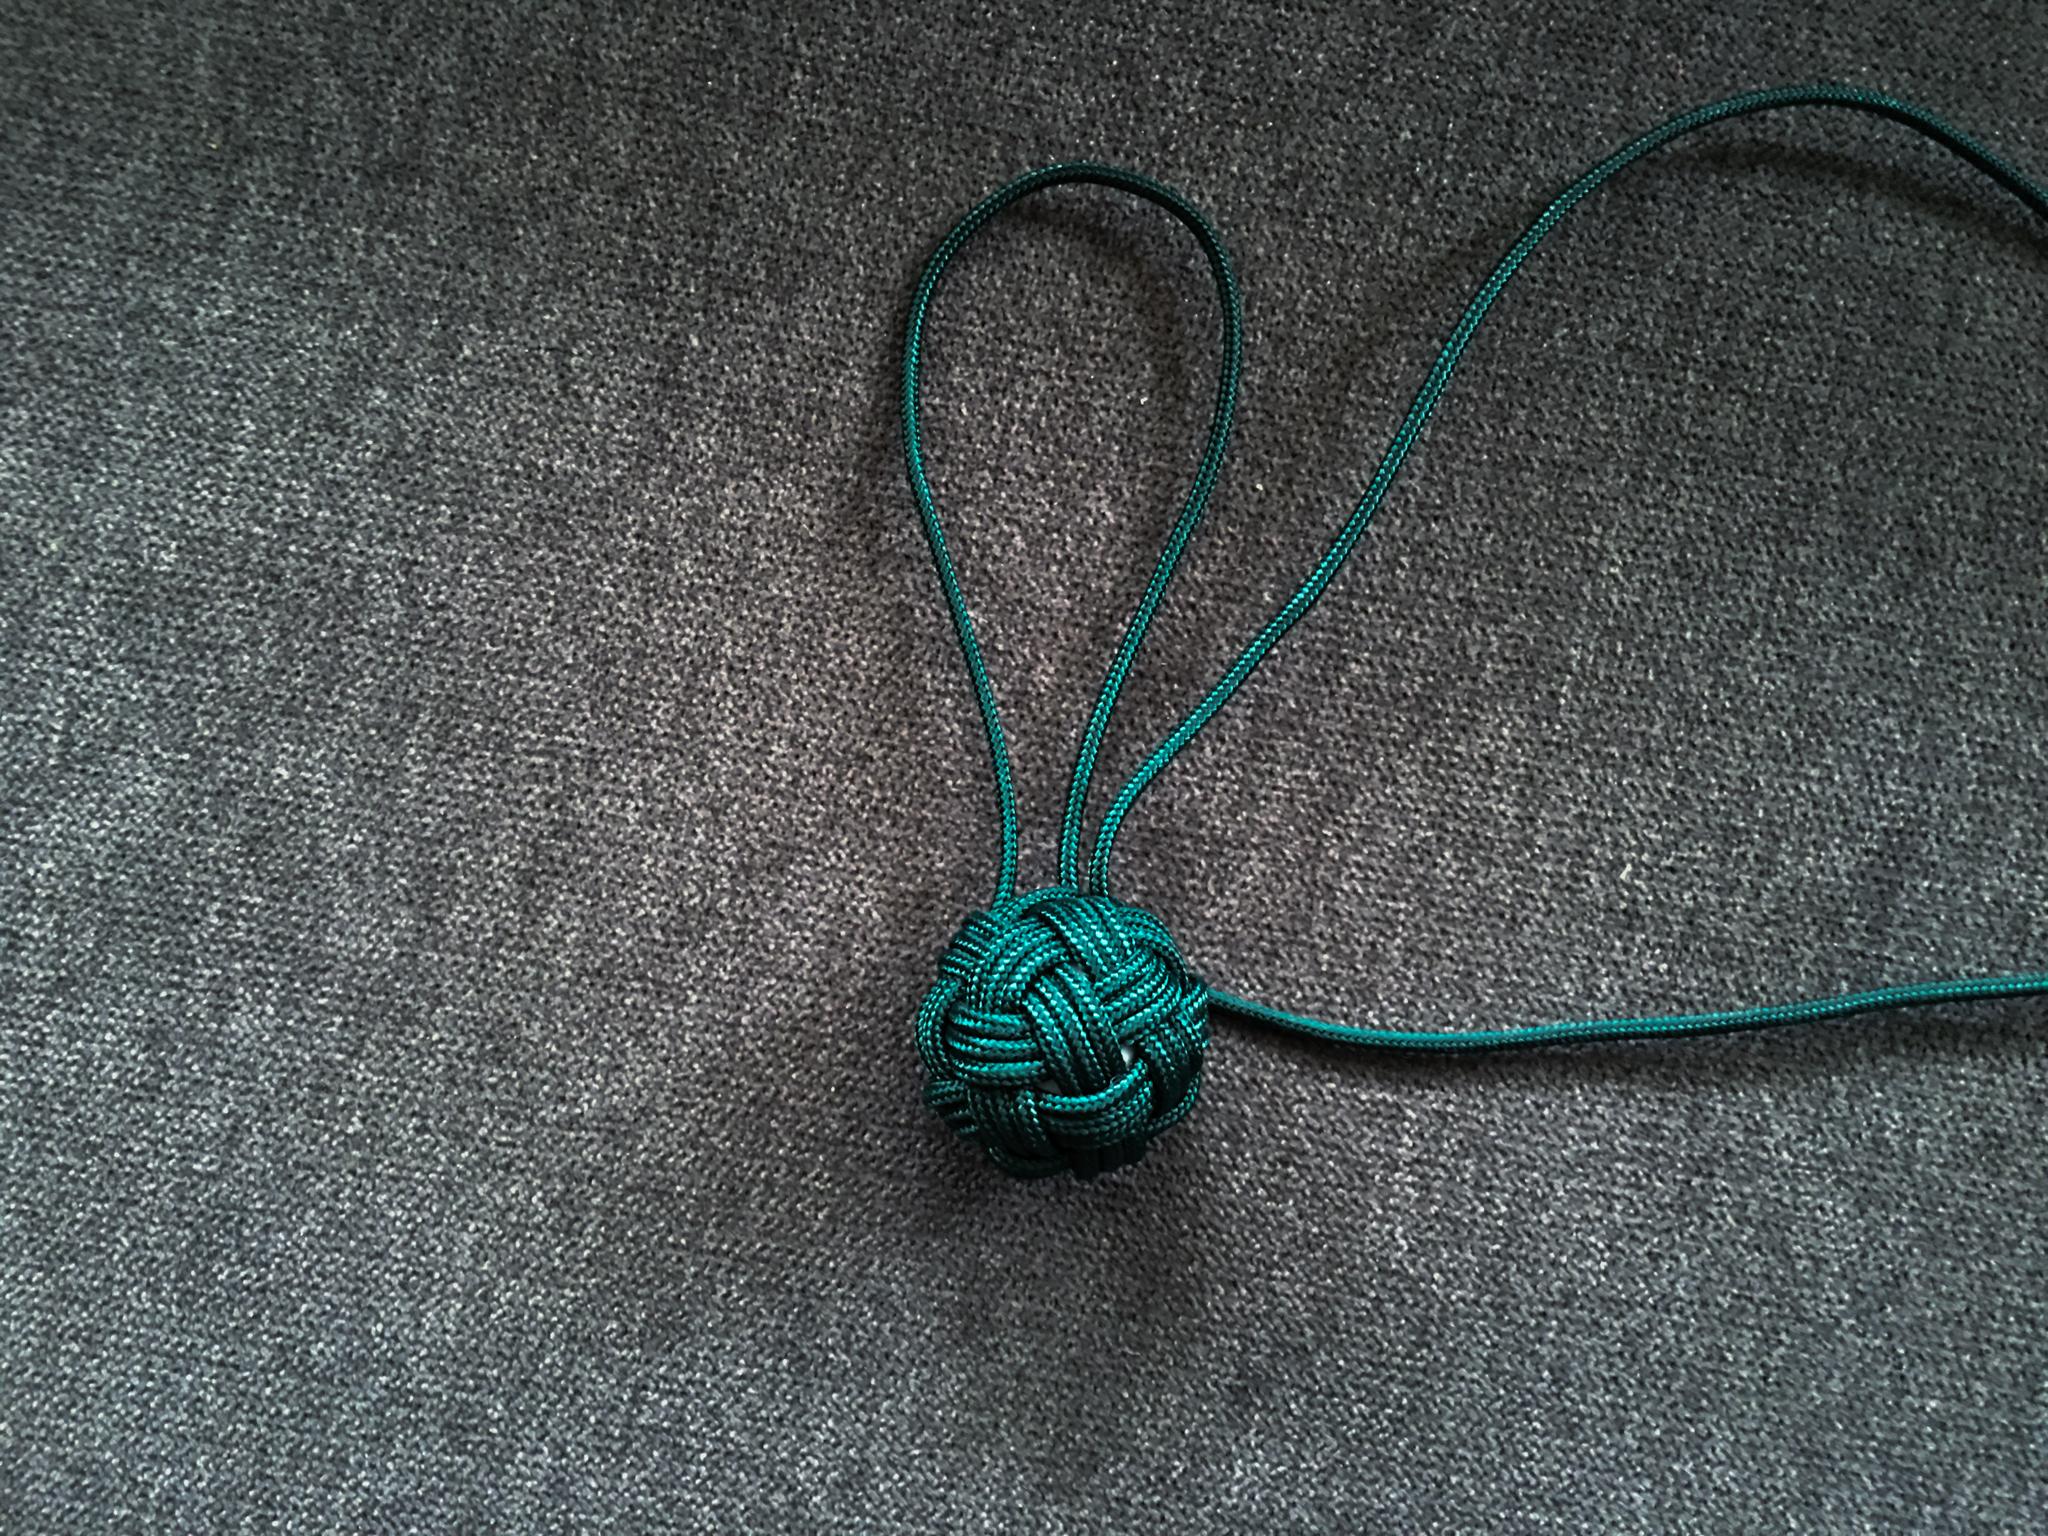 globe_knot_mandrel-15.jpg